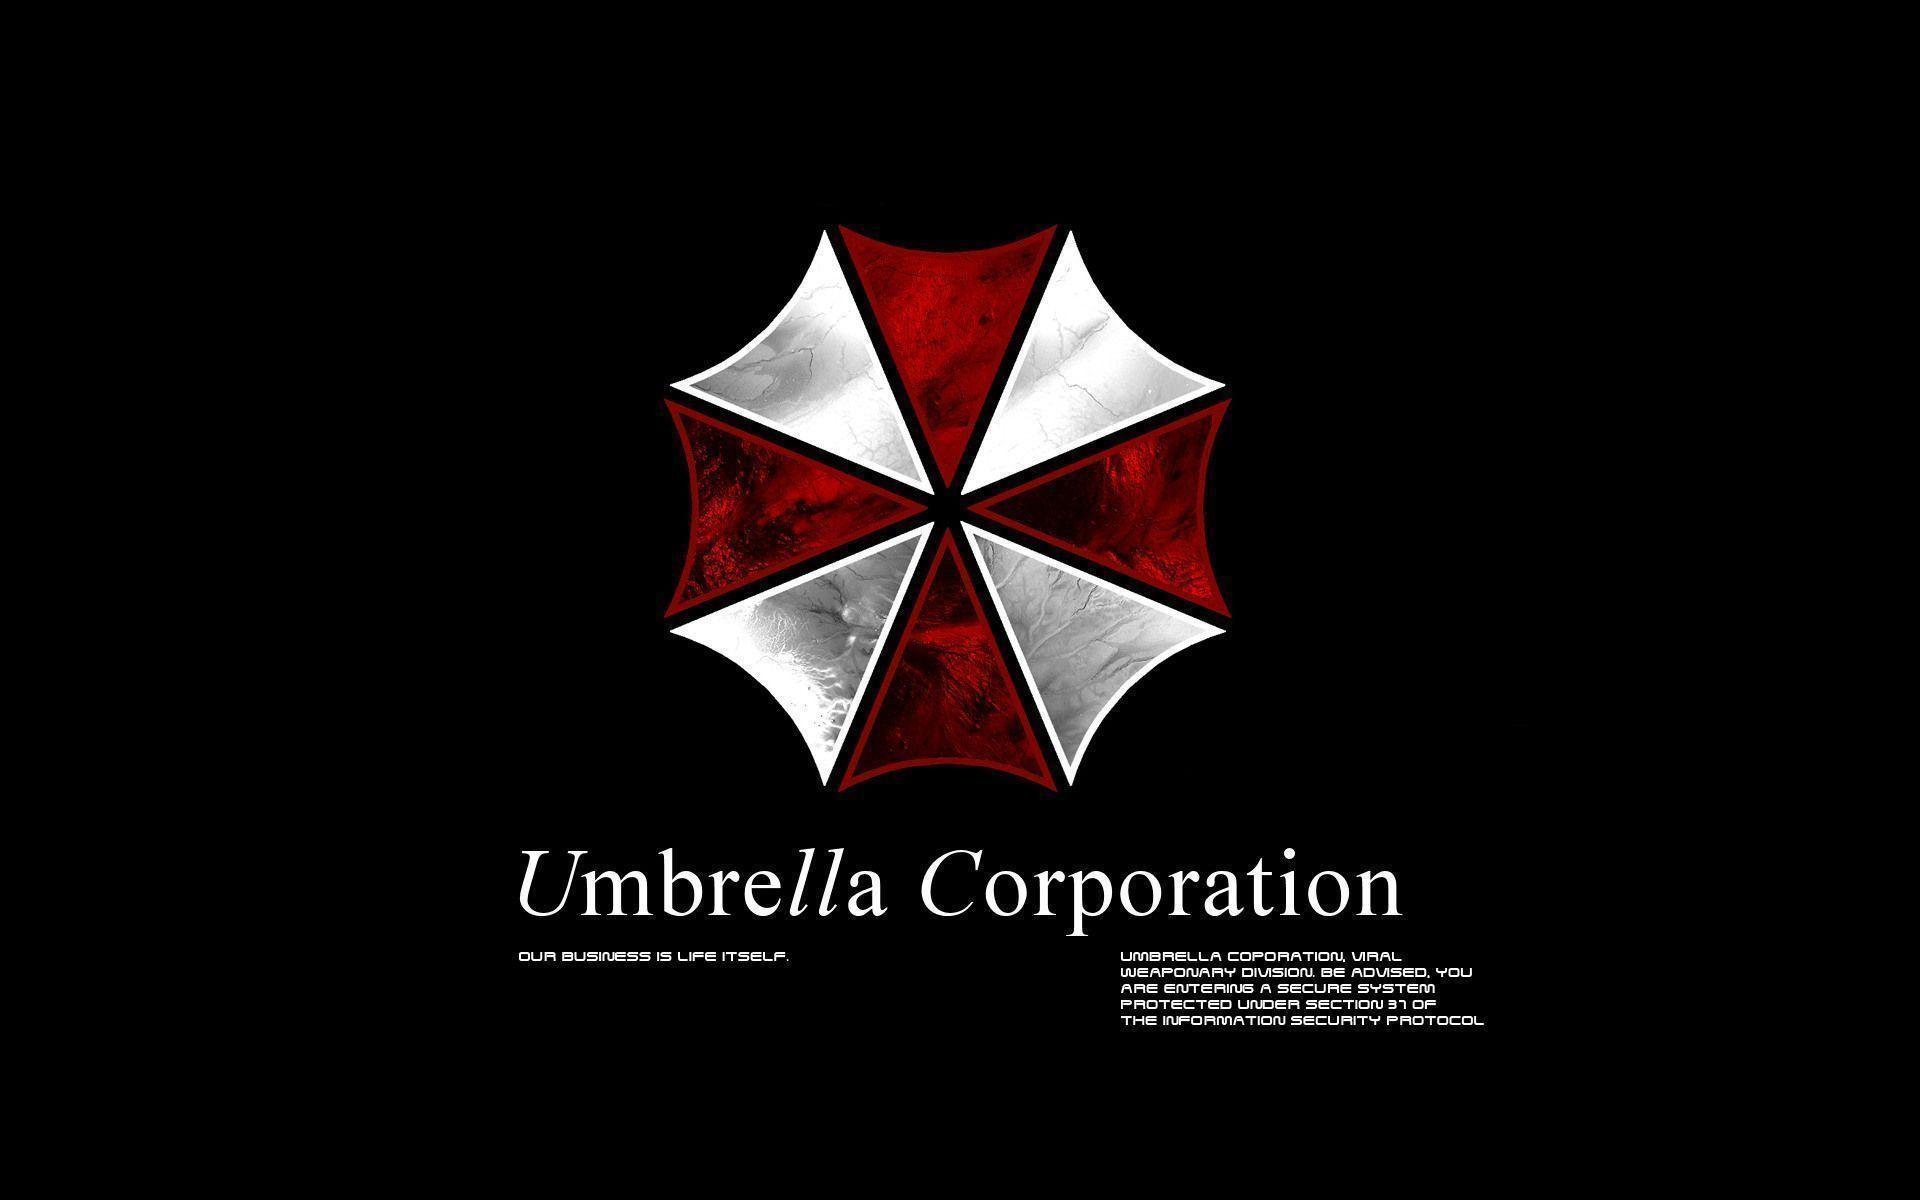 Umbrella Corporation Wallpapers – Full HD wallpaper search